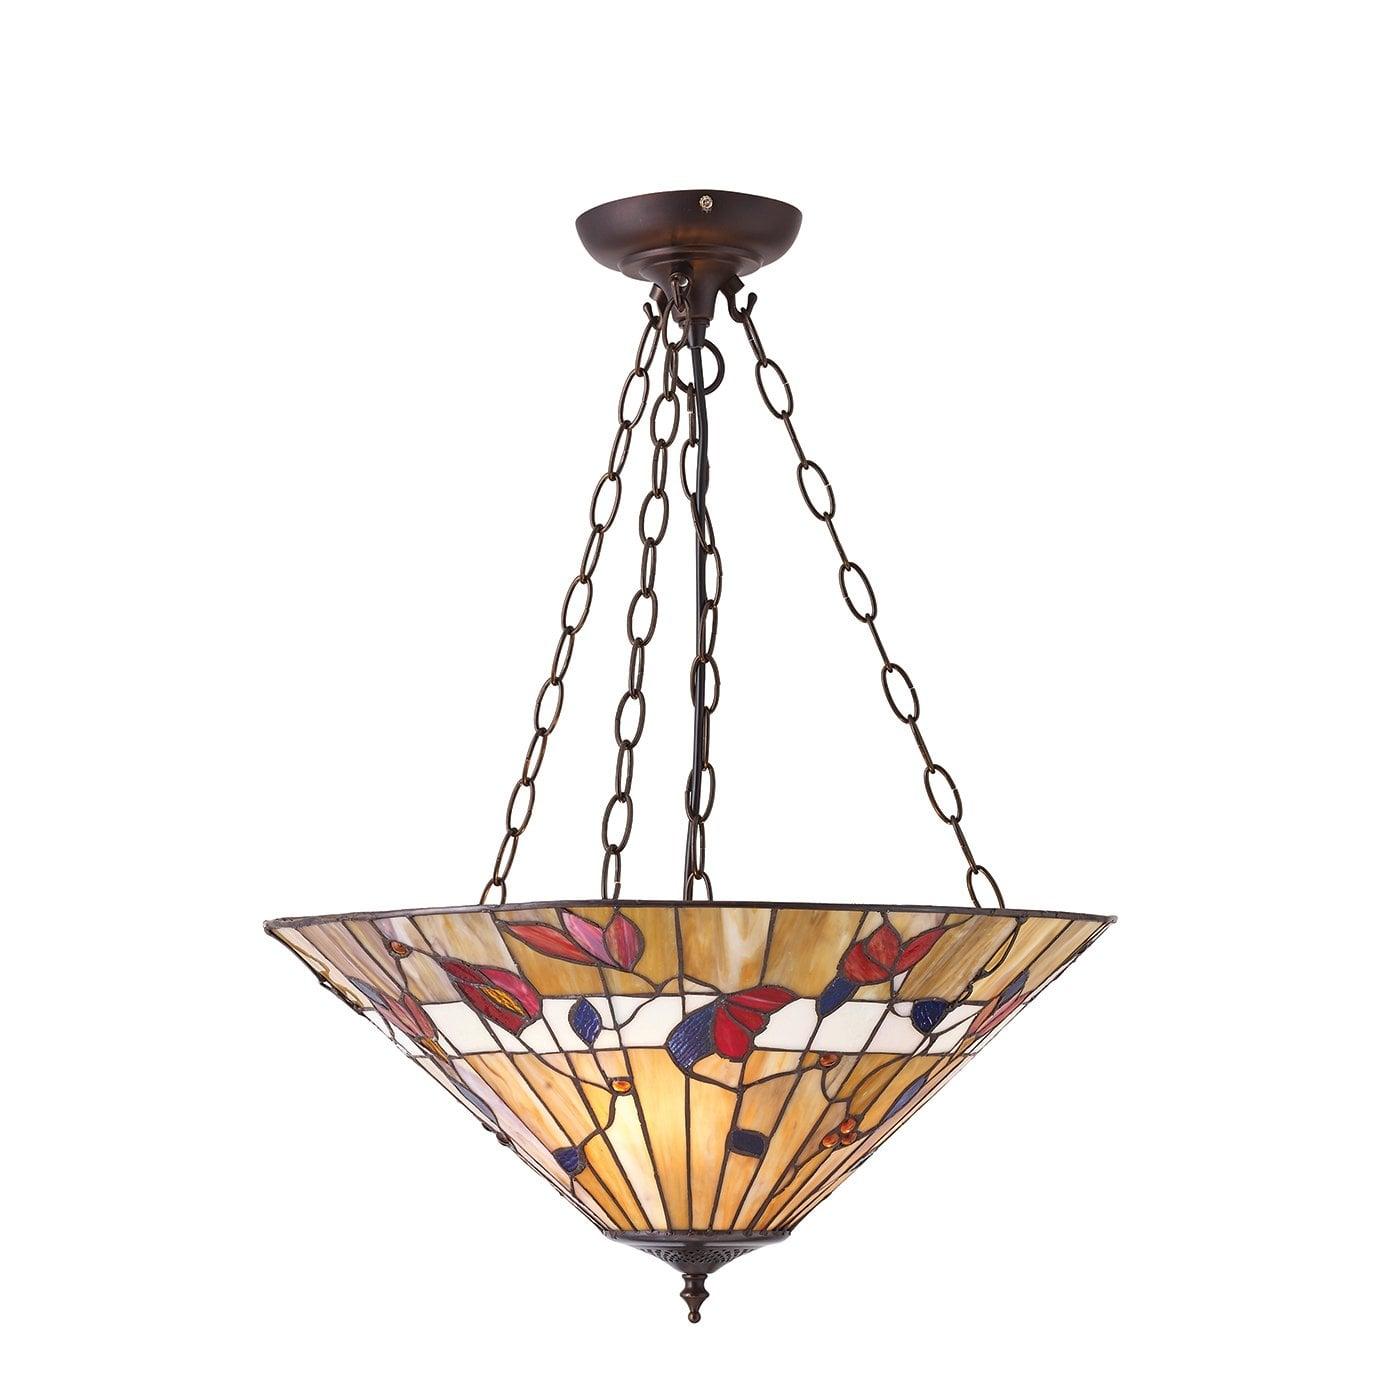 Interiors 1900 63949 Bernwood Large inverted 3lt pendant, Tiffany